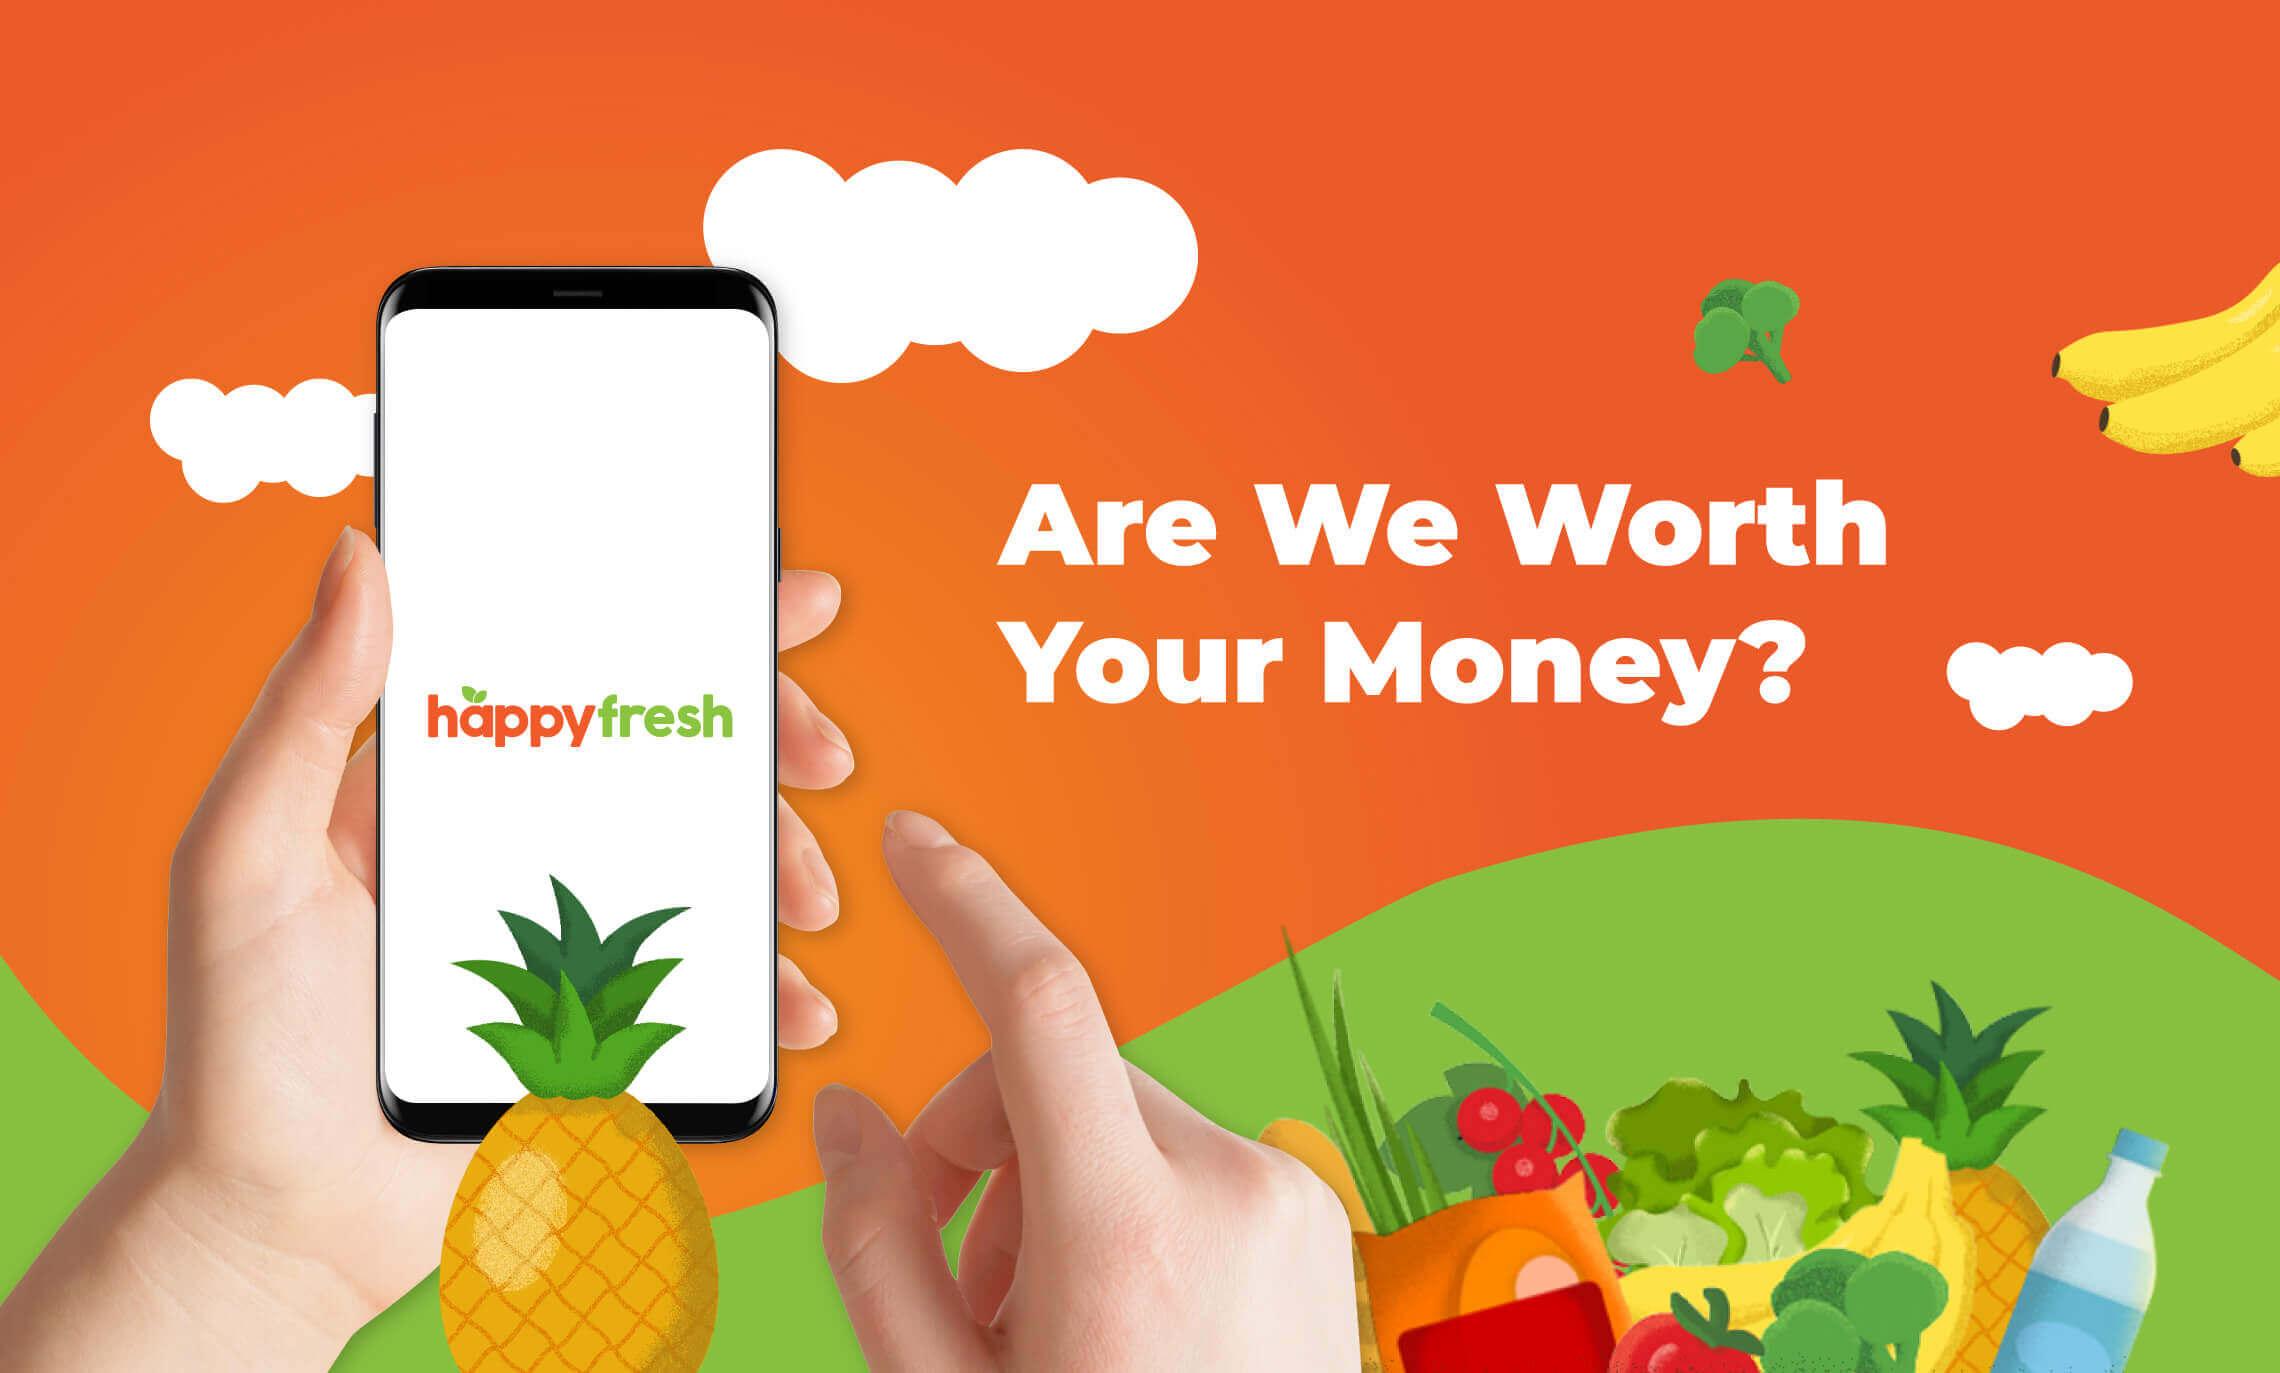 Is HappyFresh worth your money